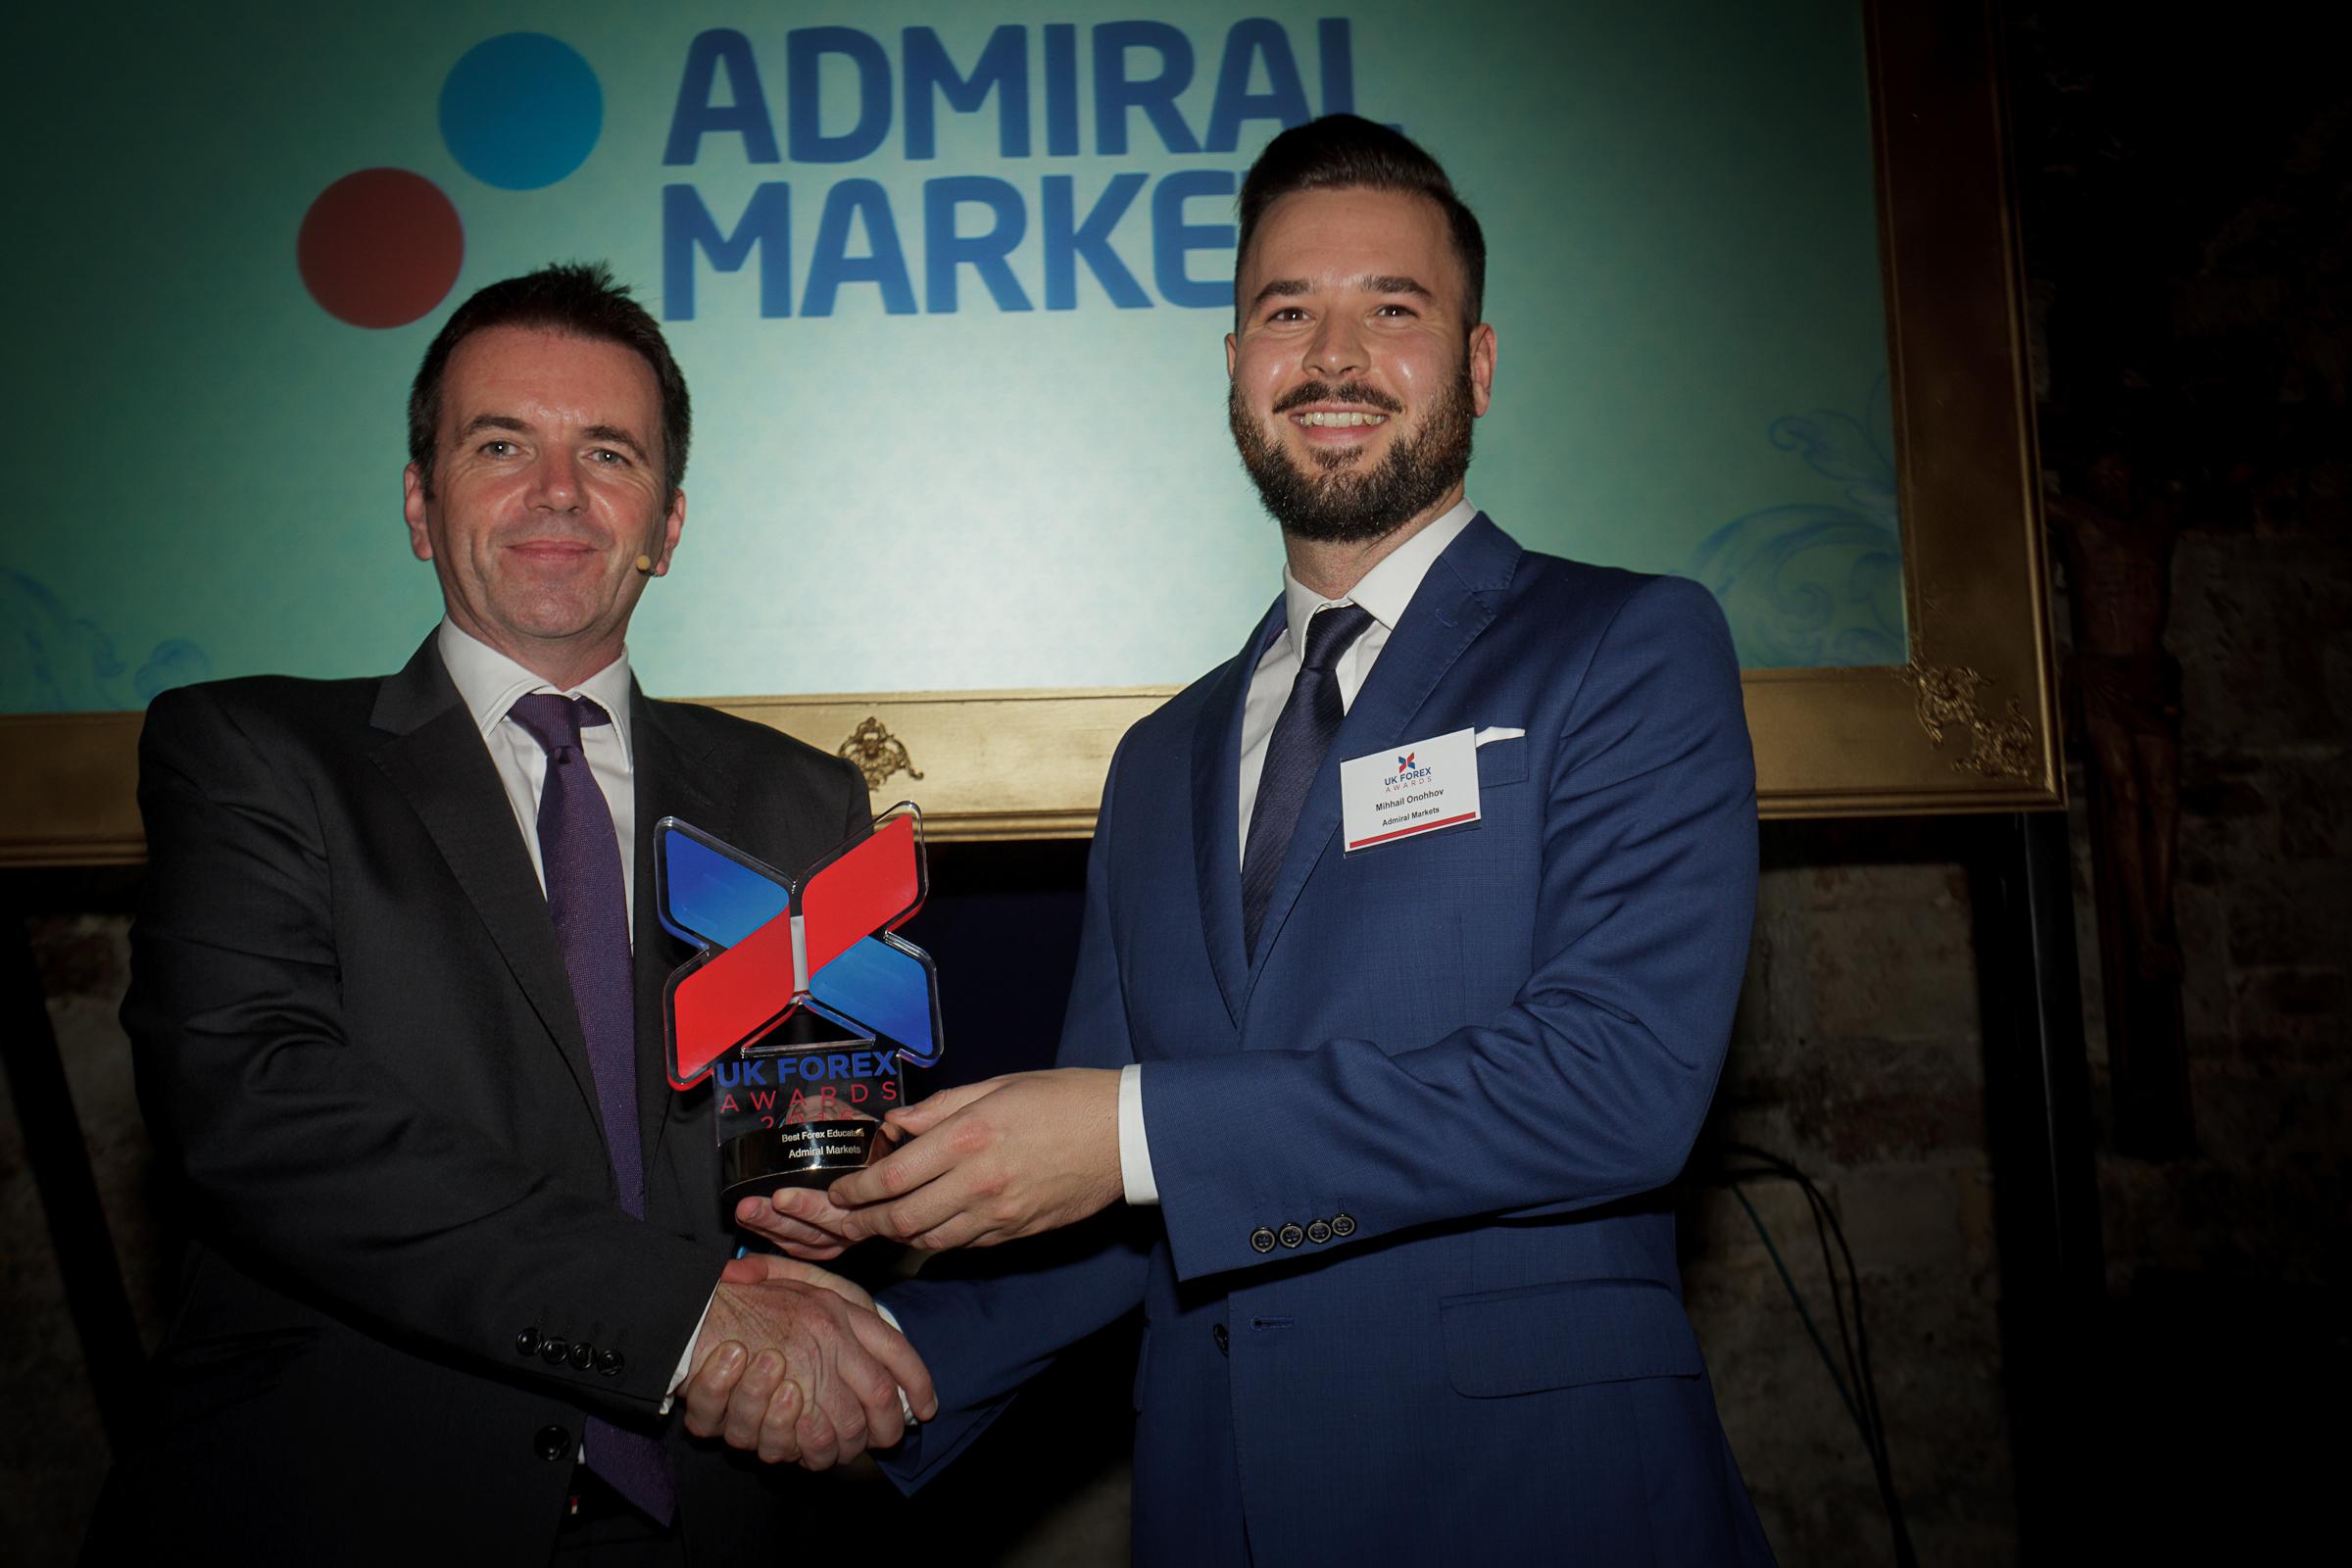 Prix de la Formation Admiral Markets